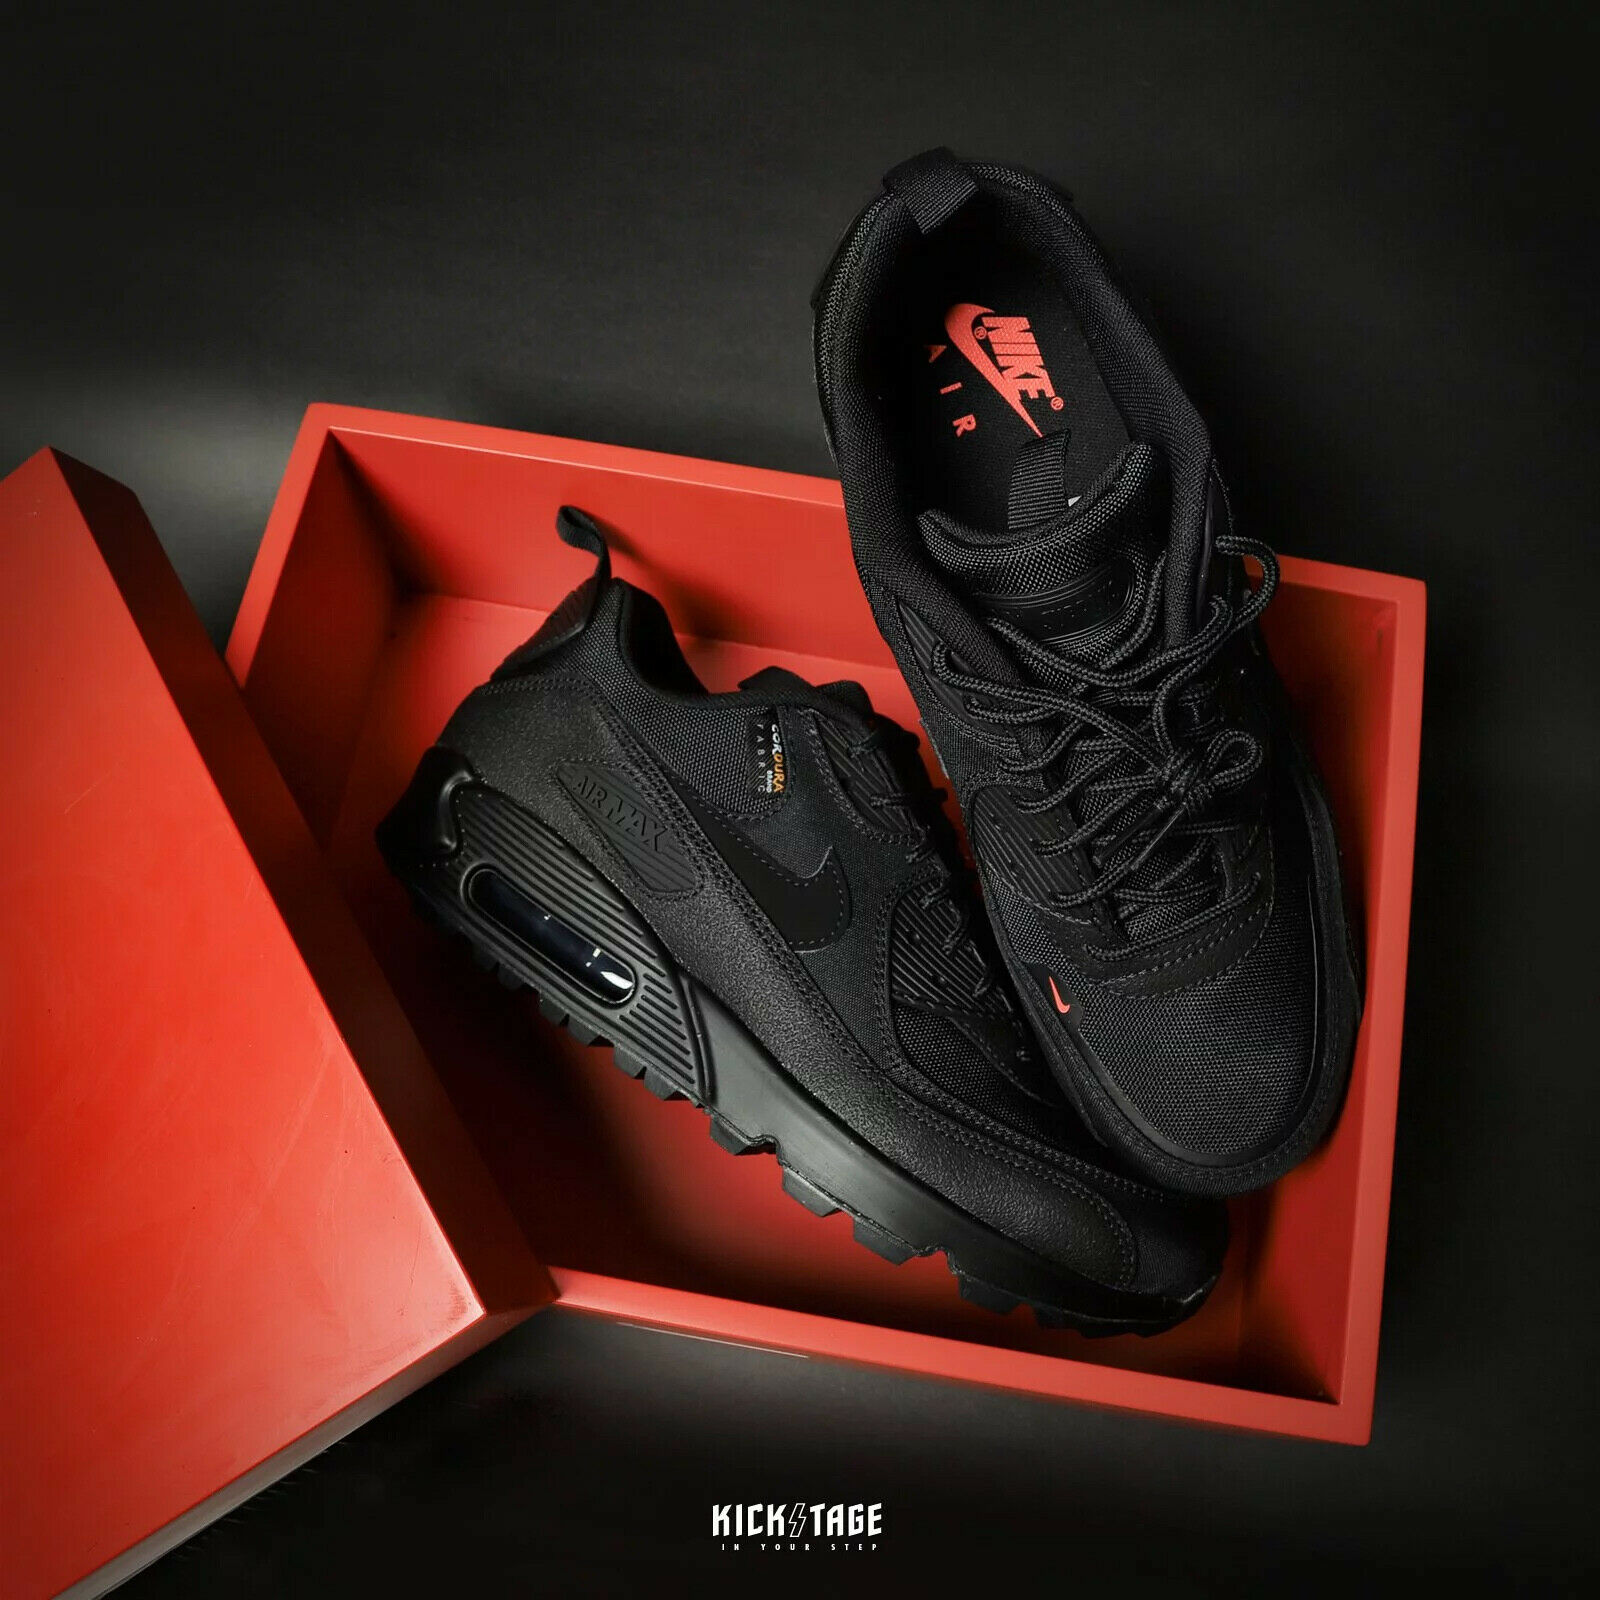 Size 13 - Nike Air Max 90 Surplus Black 2020 for sale online   eBay